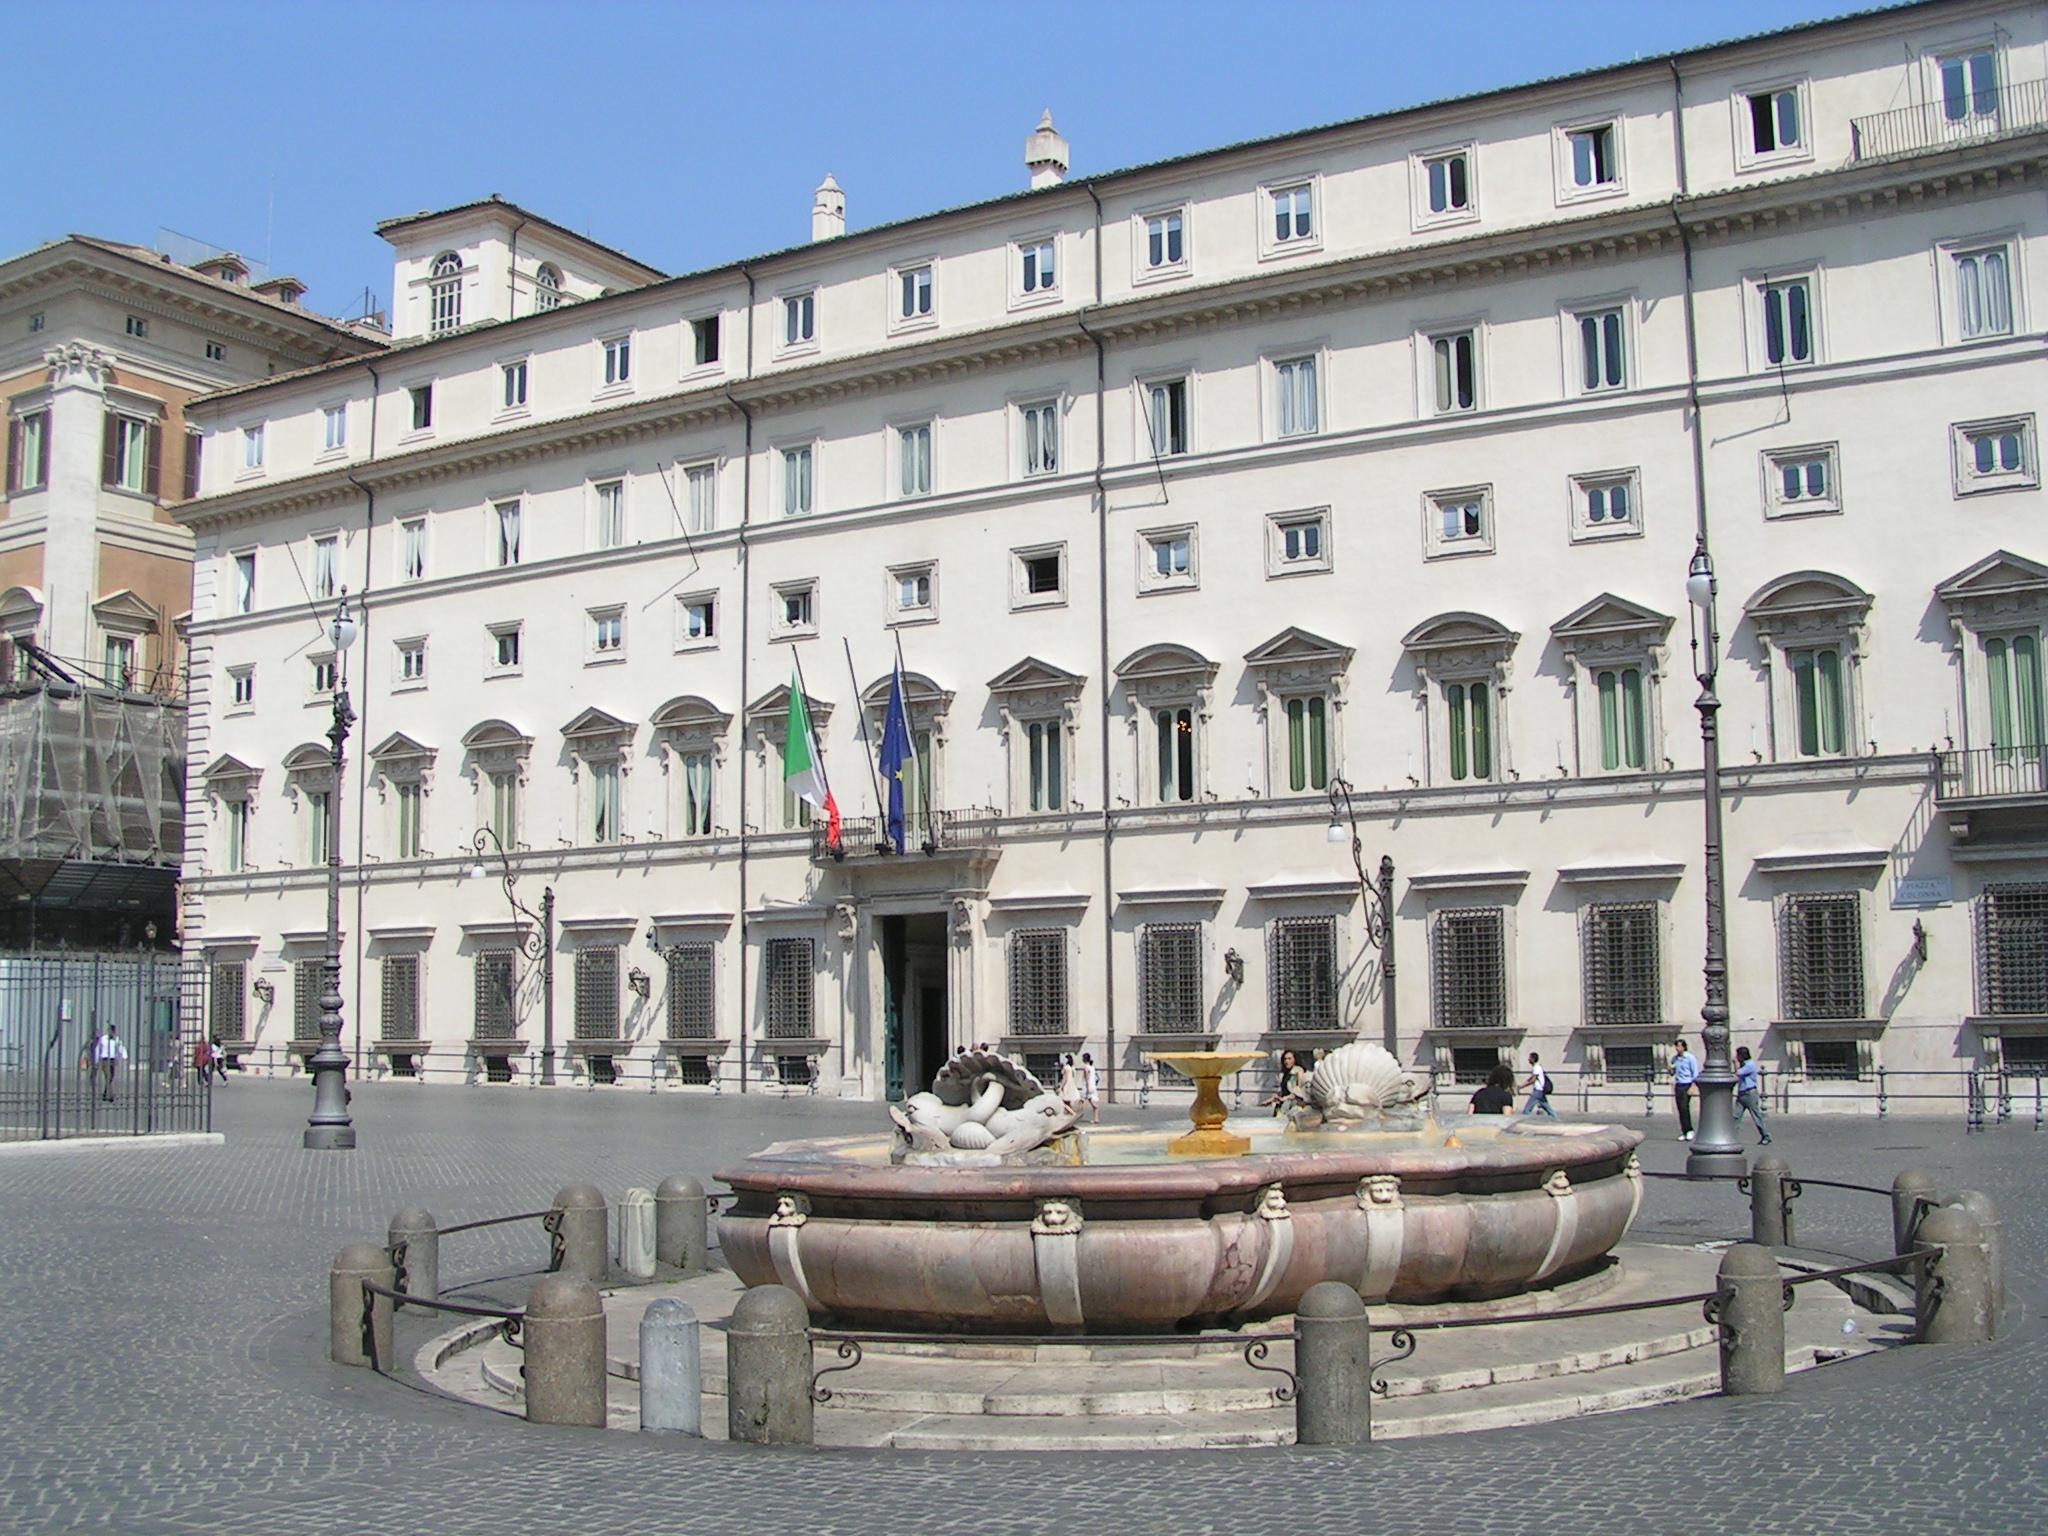 Palazzo Chigi - Photo credit: Simone Ramella